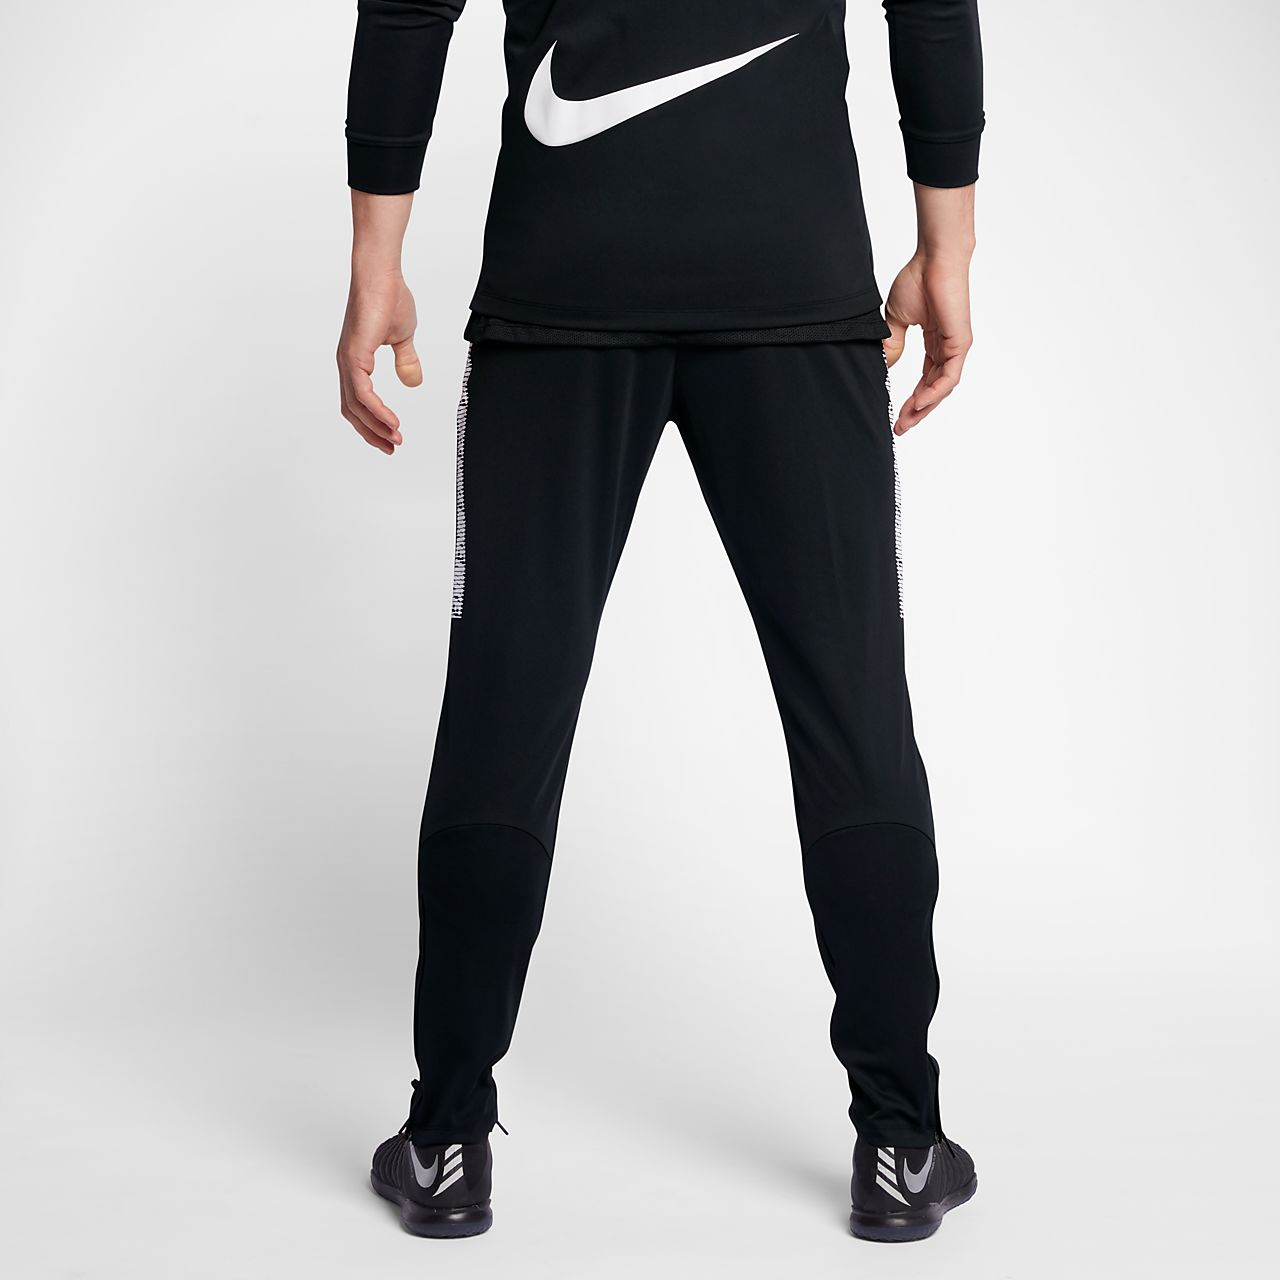 Acquista nike pantaloni felpa OFF67% sconti